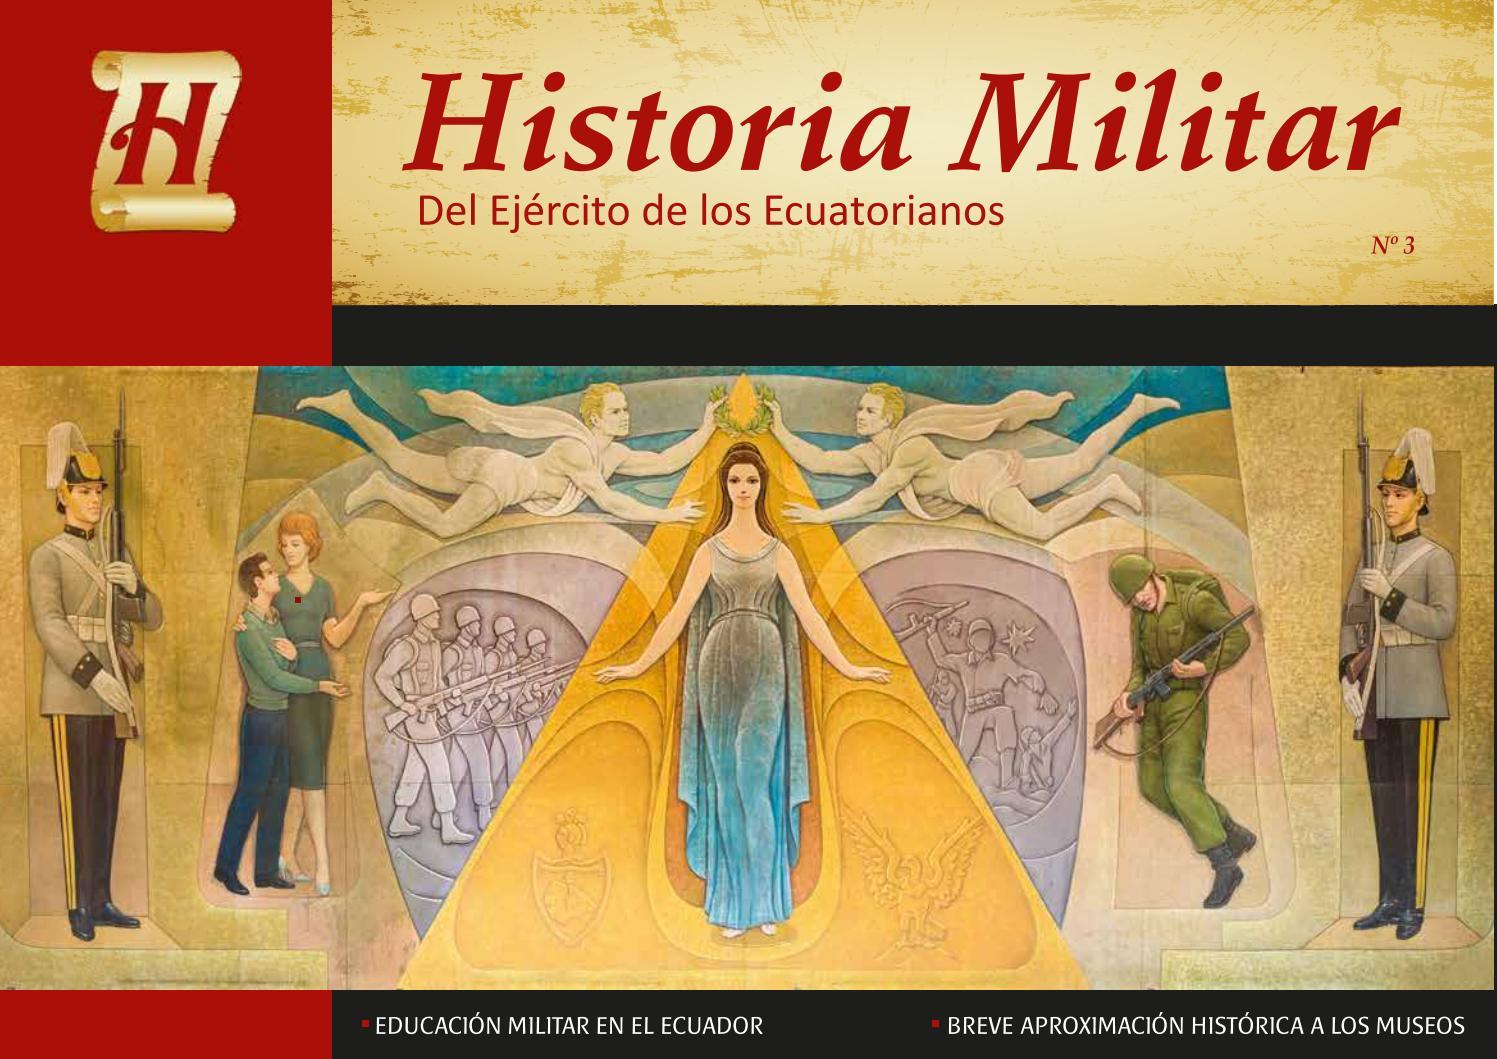 Revista historia militar vol 3 by Centro de Estudios Históricos del ...